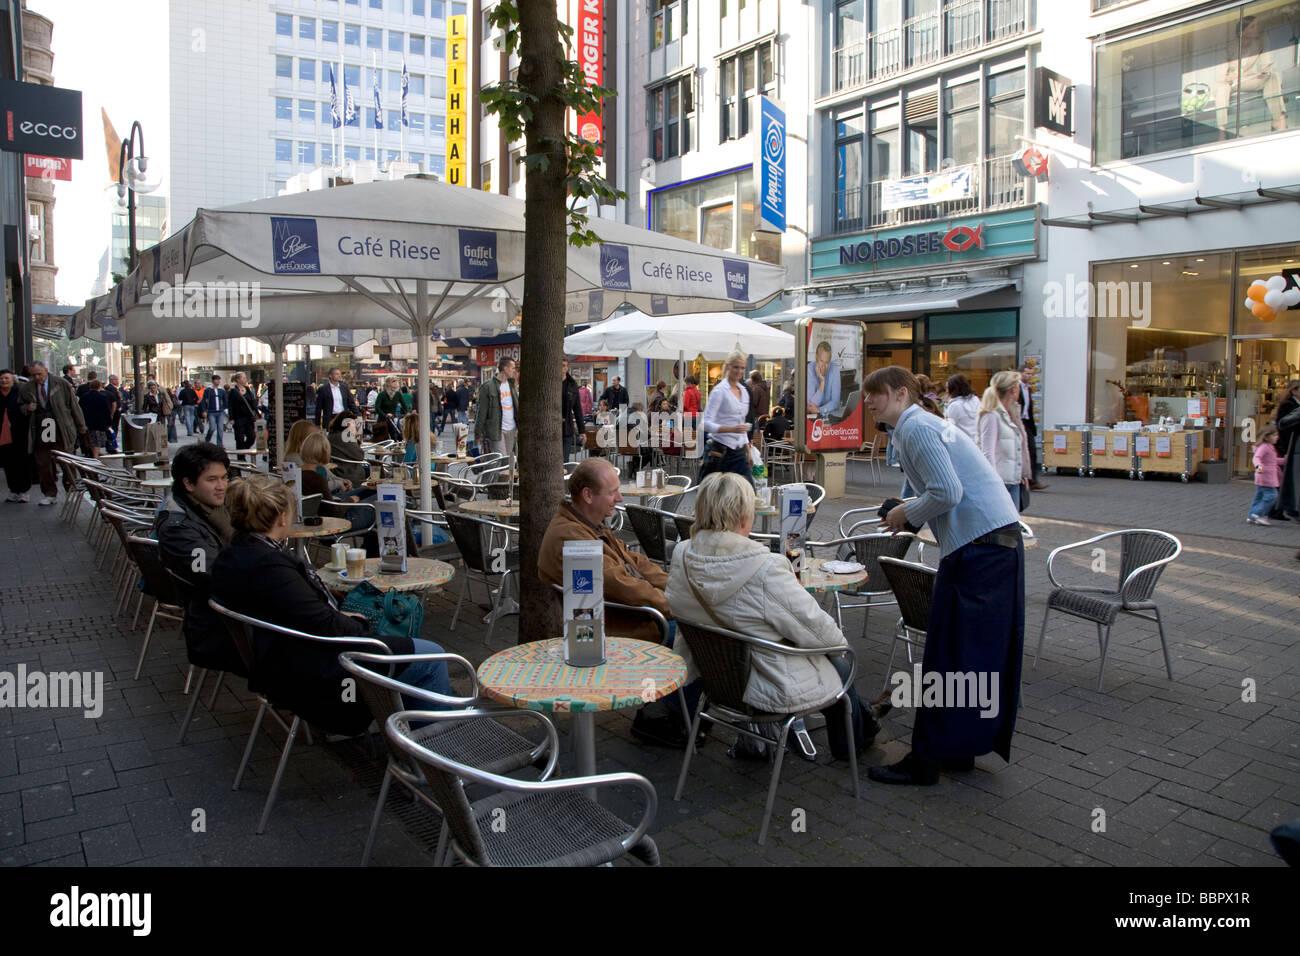 cafe street scene cologne germany